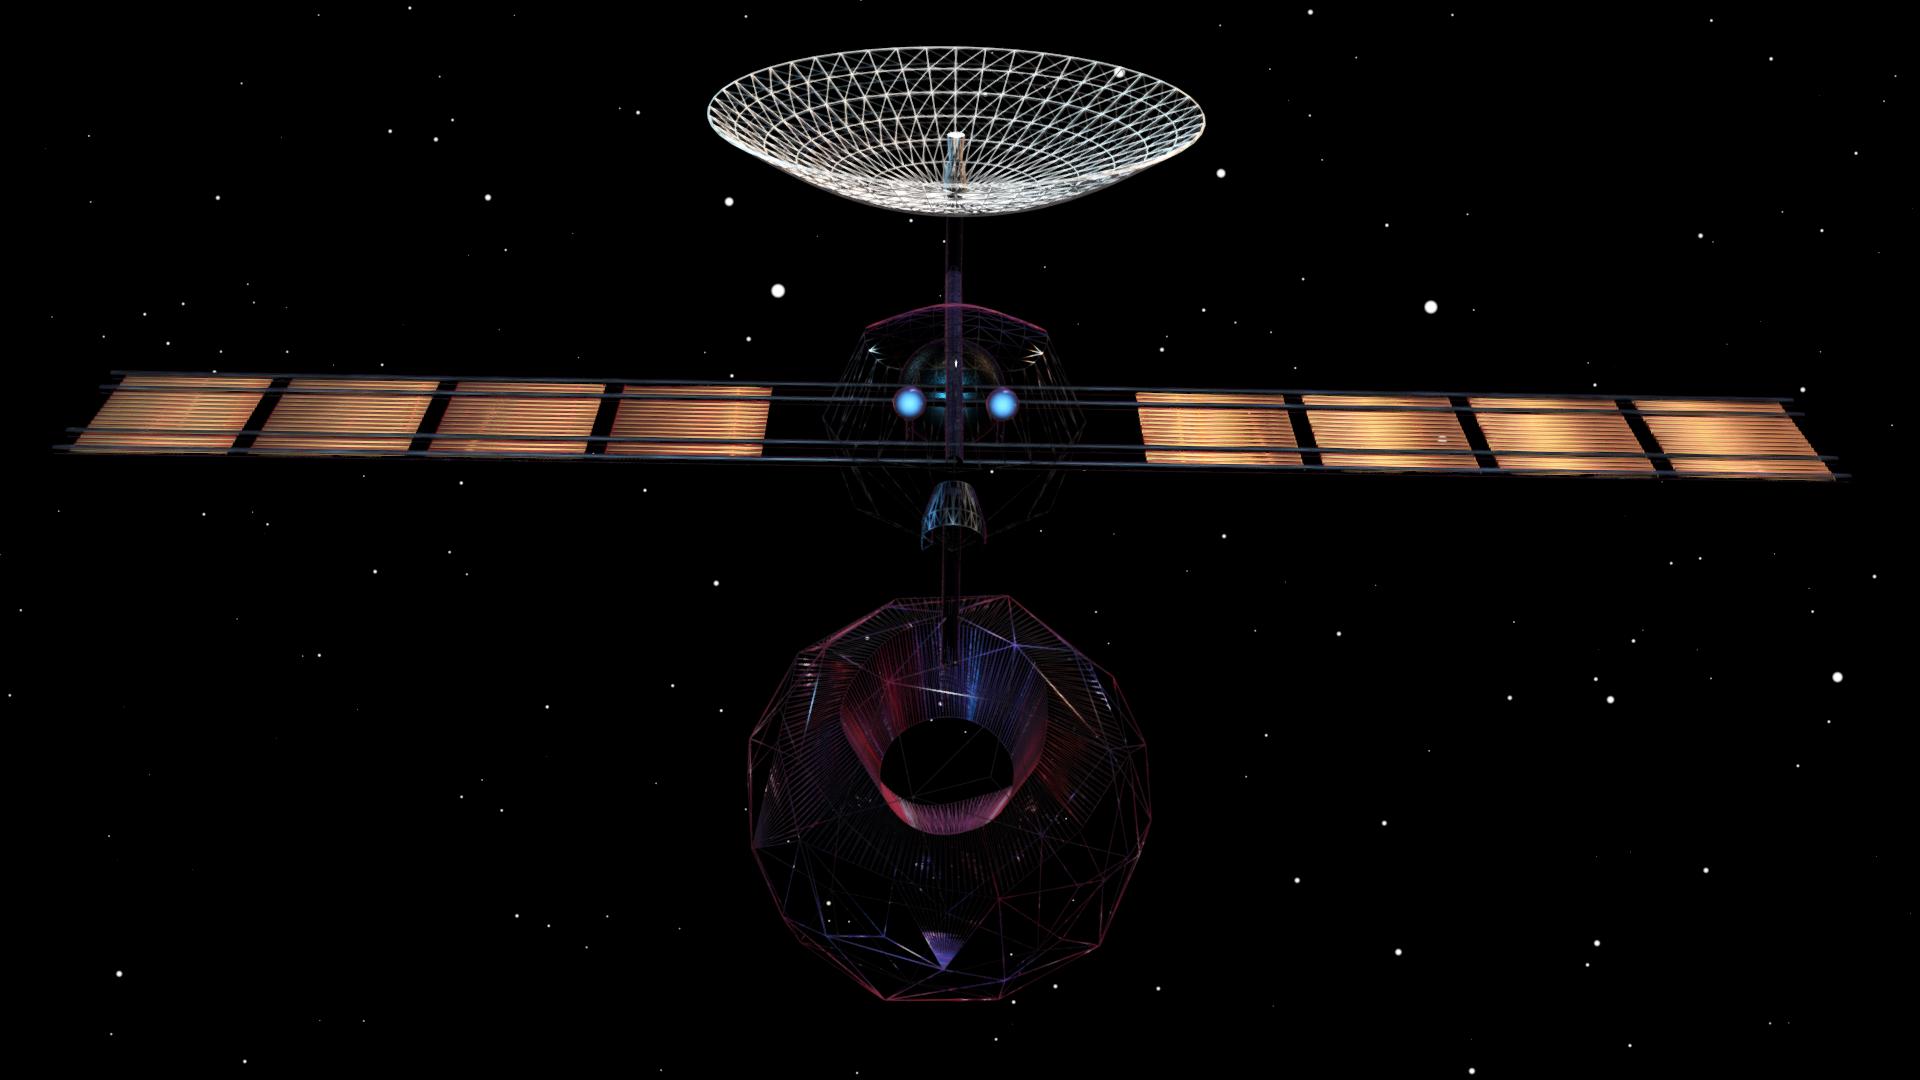 space probe models - photo #9